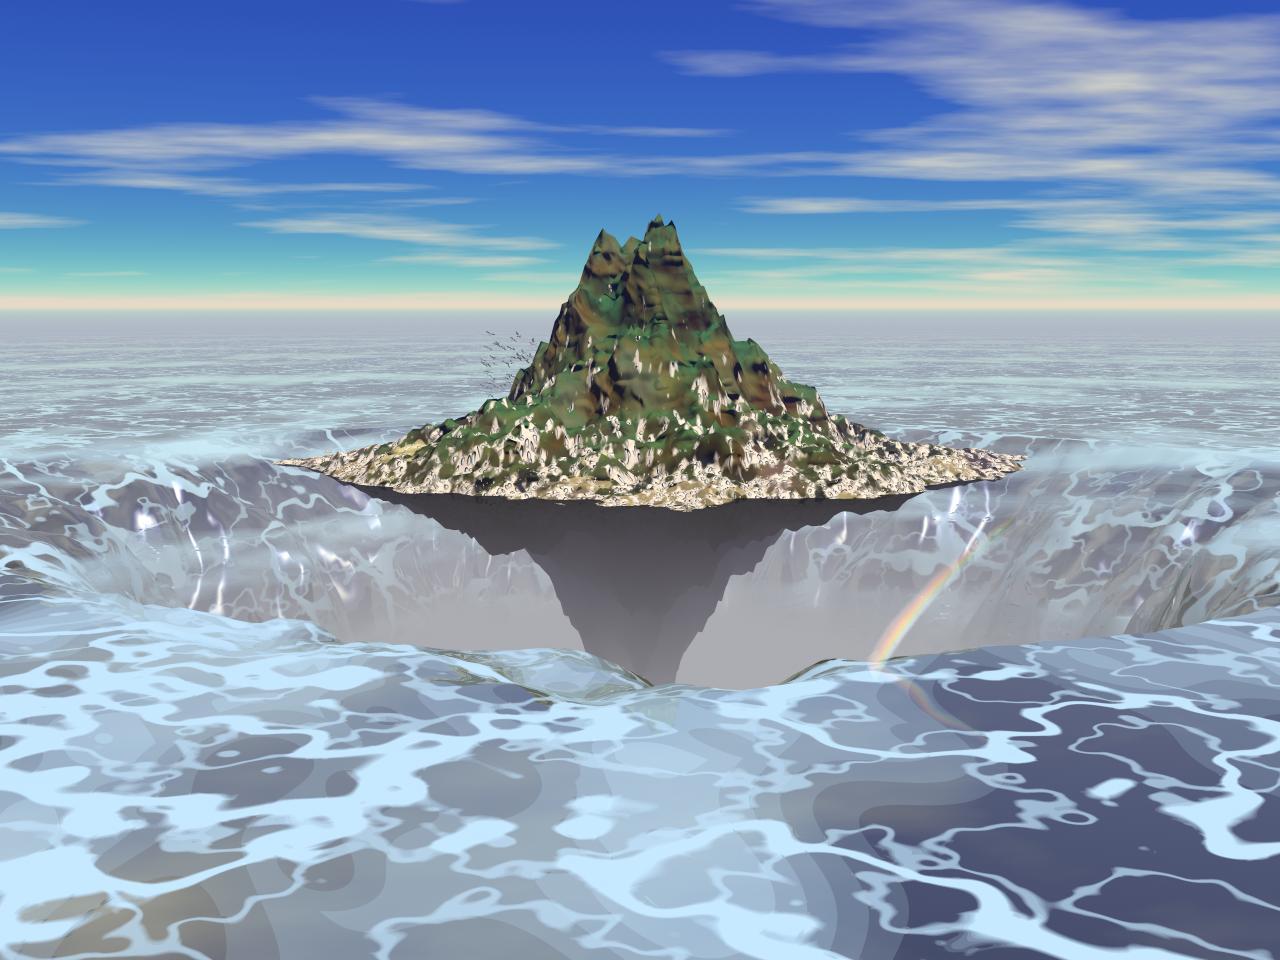 Shoreless Island